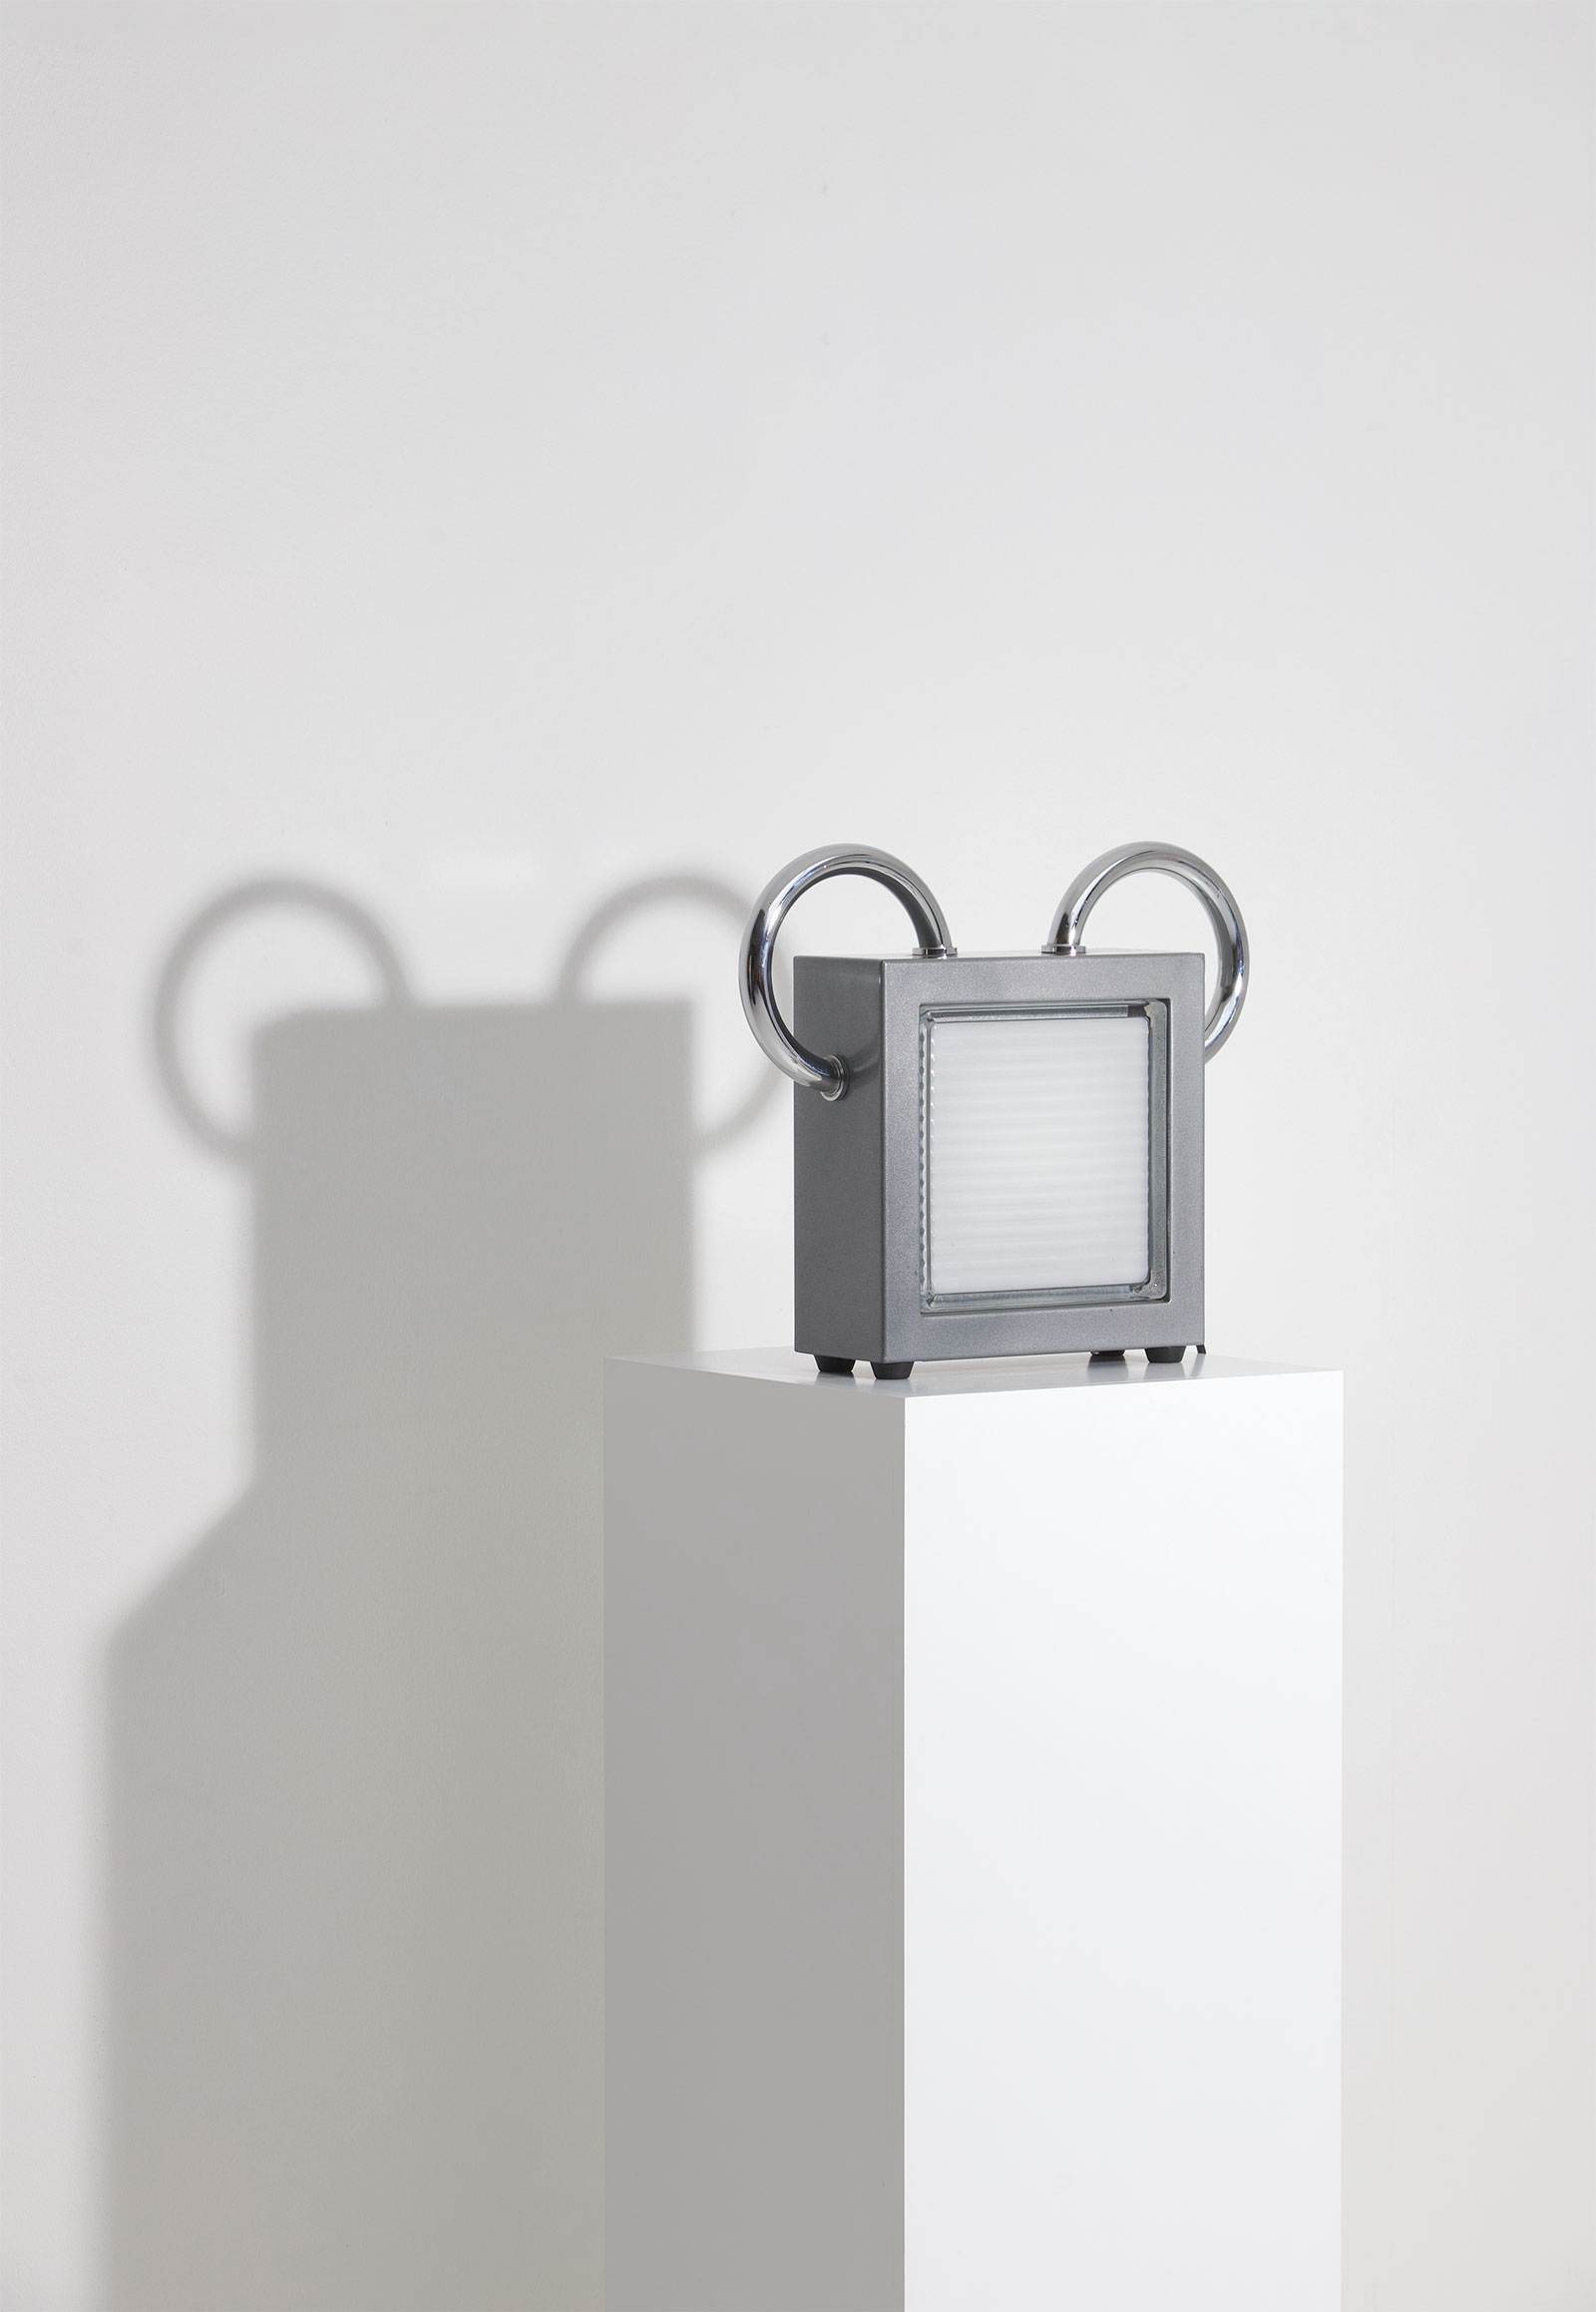 Matteo Thun Topolino table lamp 1989